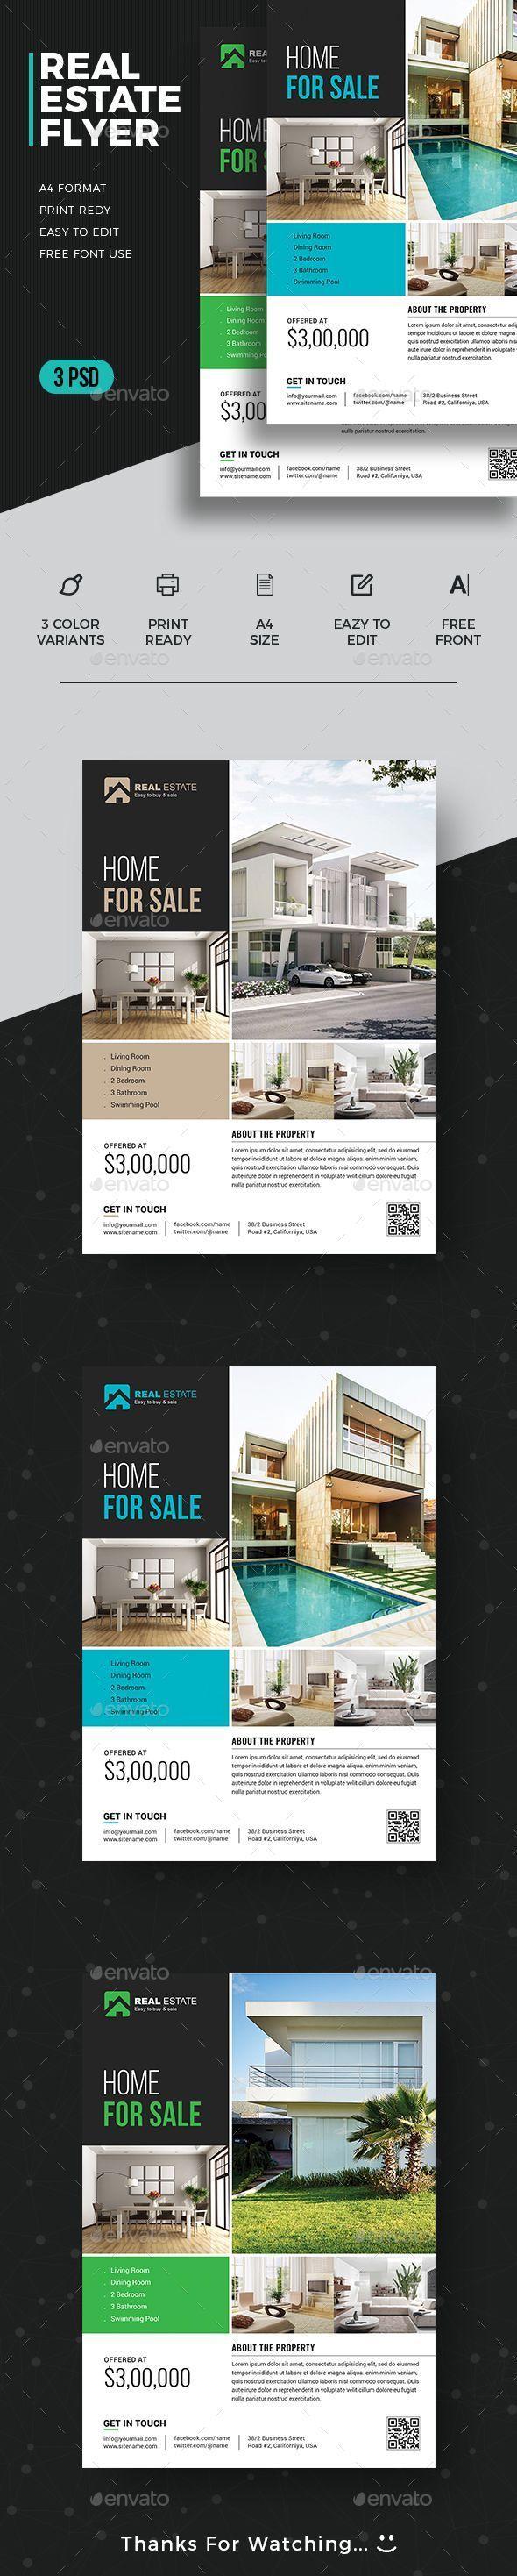 #Real #Estate #Flyer - Commerce Flyers Download here: https://graphicriver.net/item/real-estate-flyer/19501603?ref=alena994